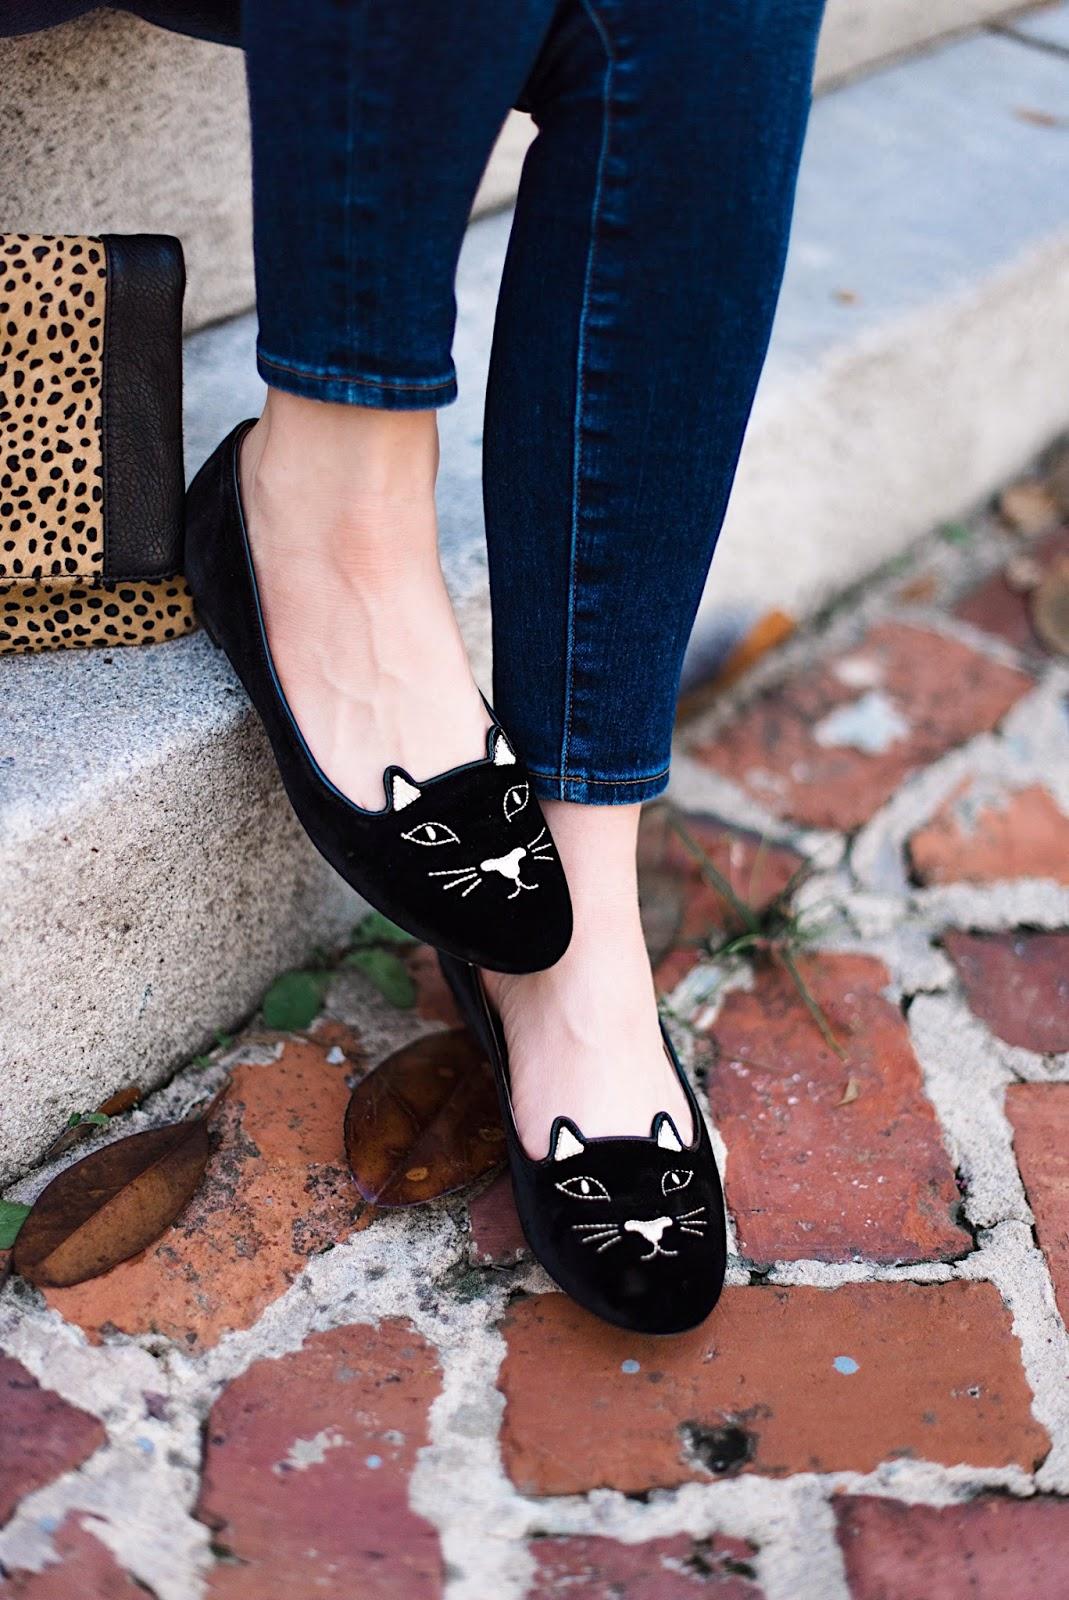 Charlotte Olympia Kitty Flats - Something Delightful Blog